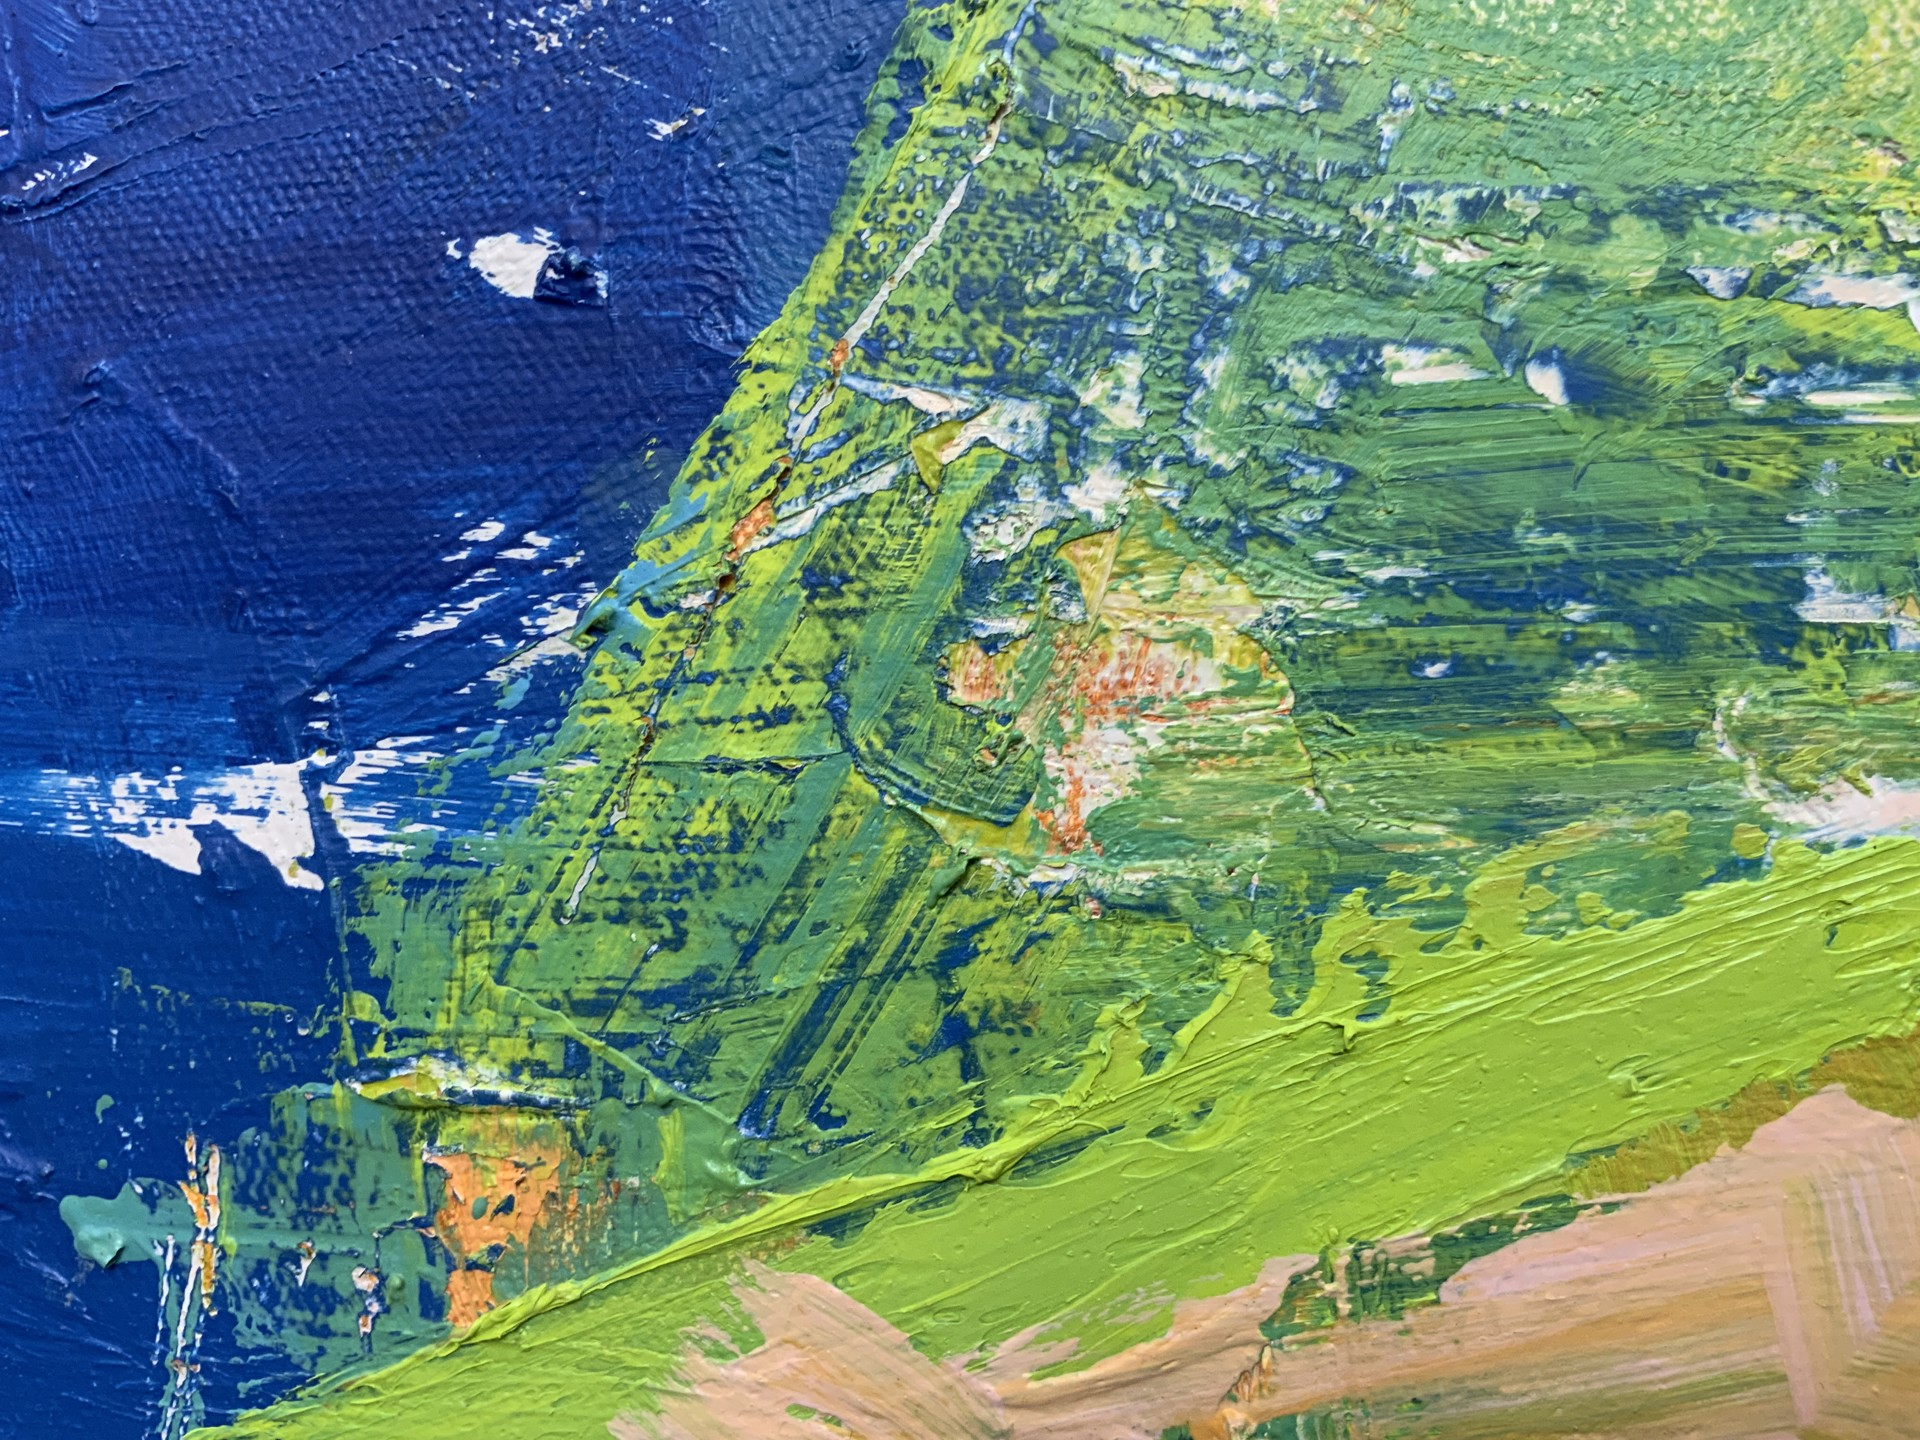 Remembering Curaçao 8 V5 by Steven Page Prewitt